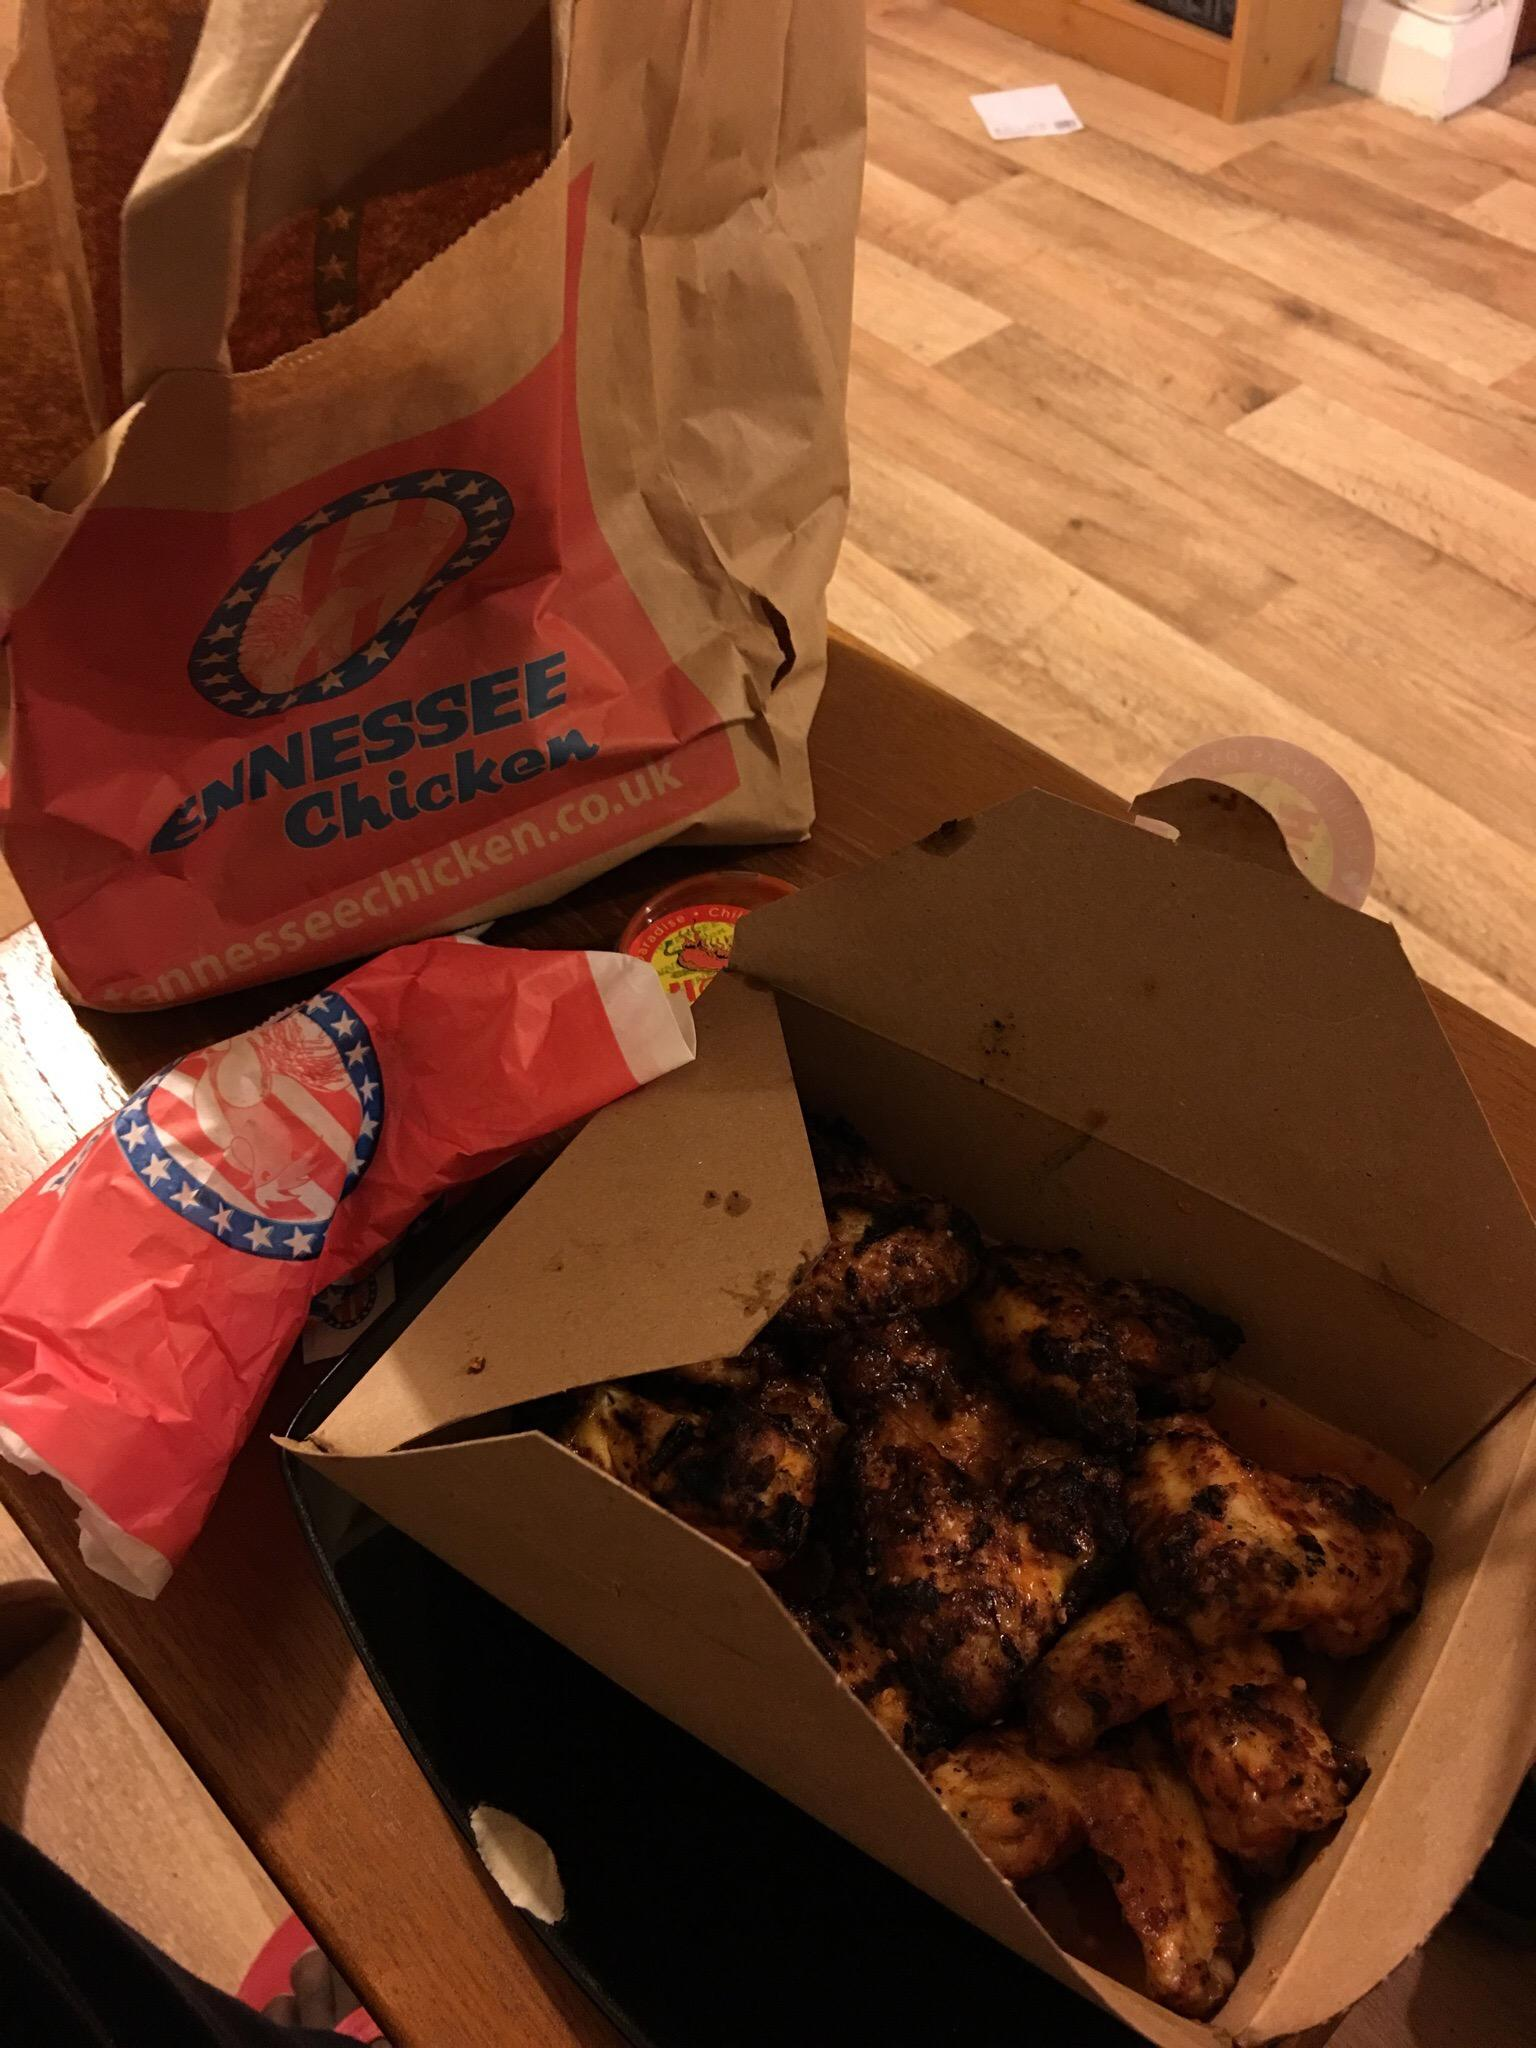 Tennessee Fried Chicken, Swindon